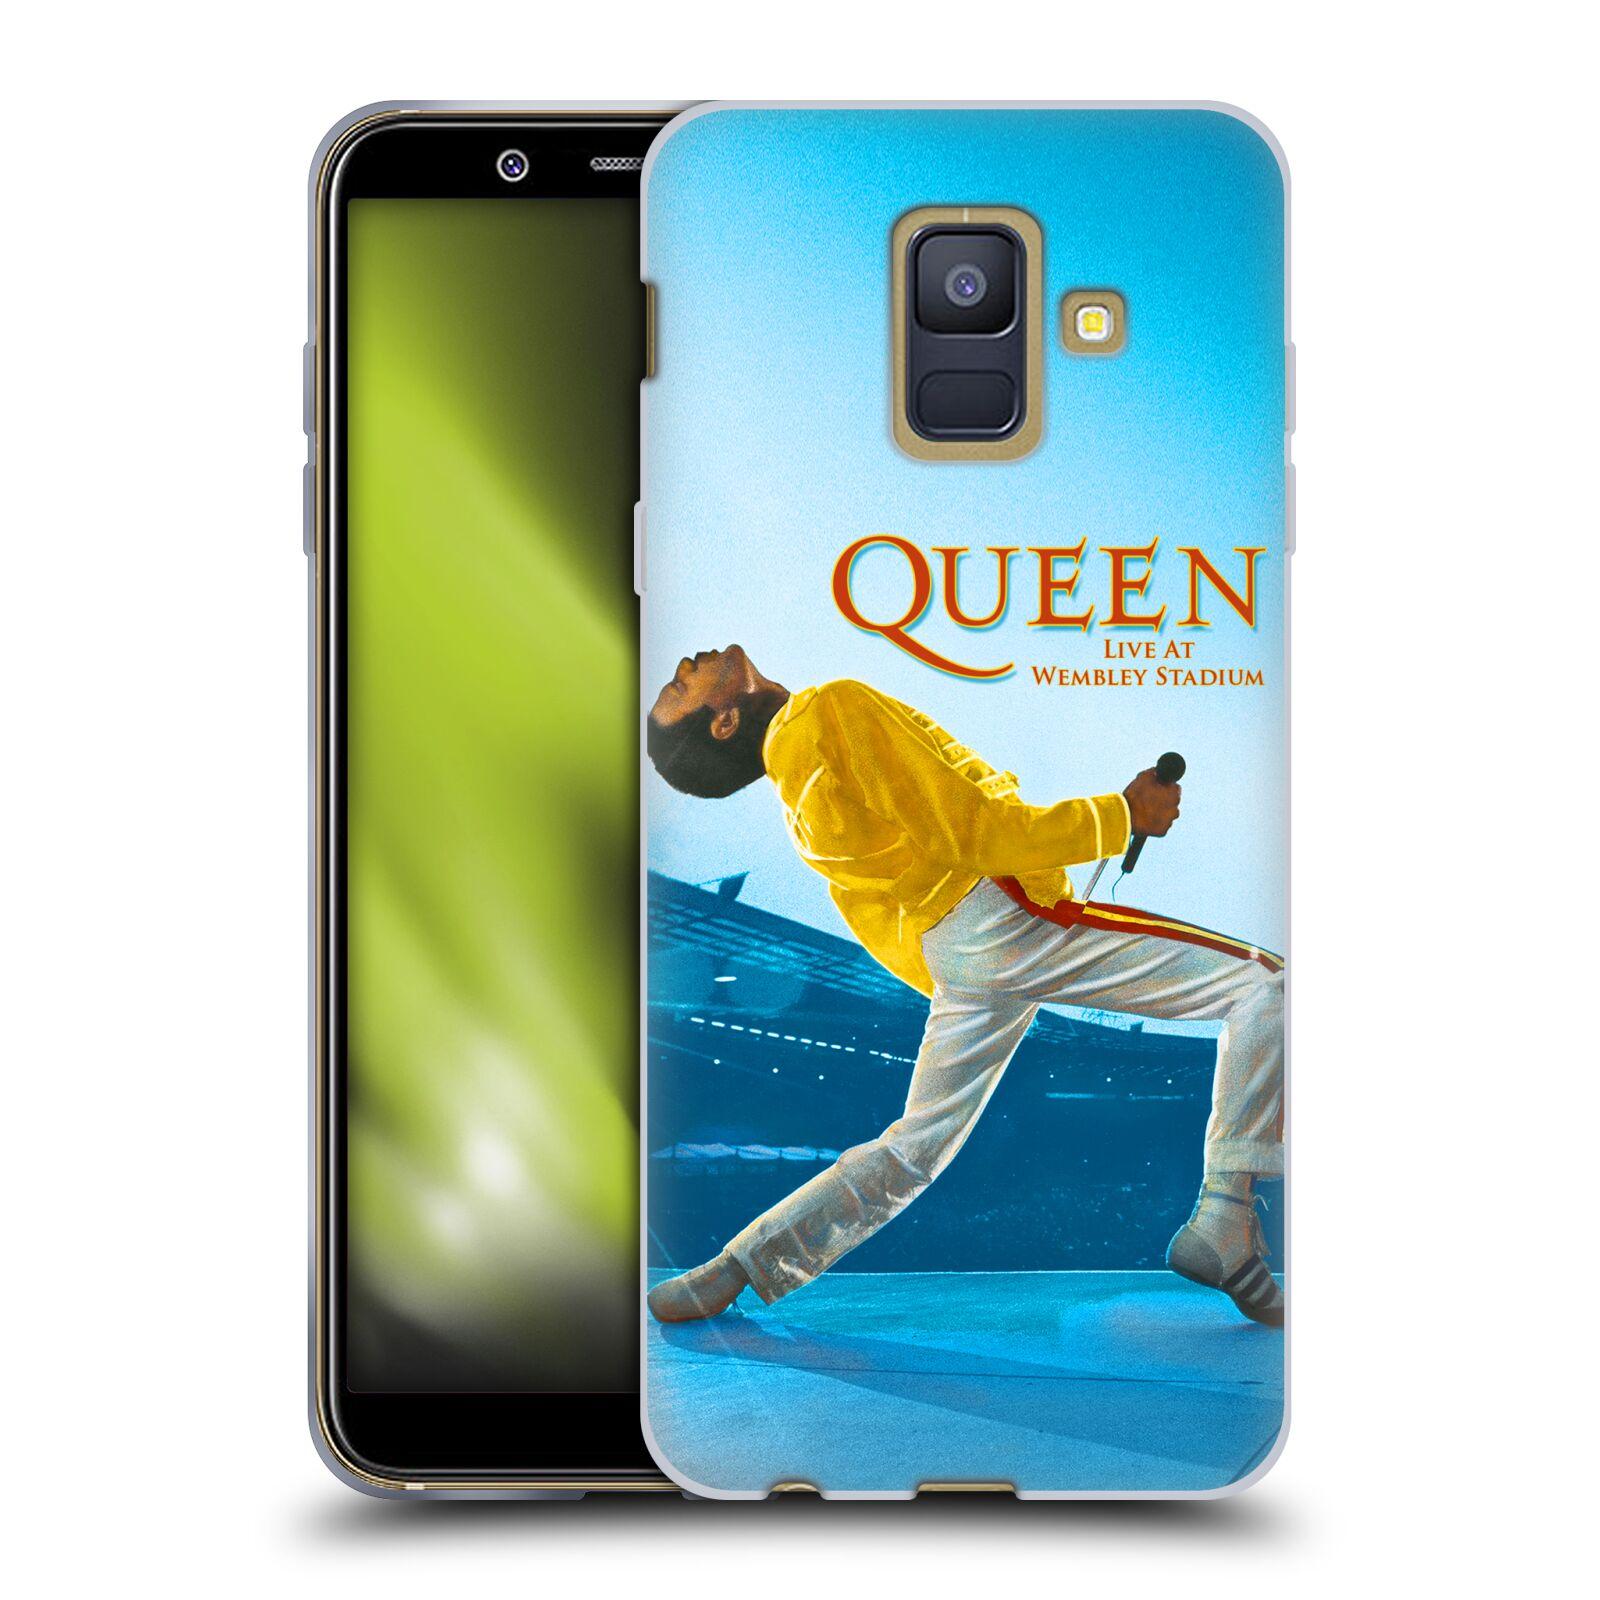 Silikonové pouzdro na mobil Samsung Galaxy A6 (2018) - Head Case - Queen - Freddie Mercury